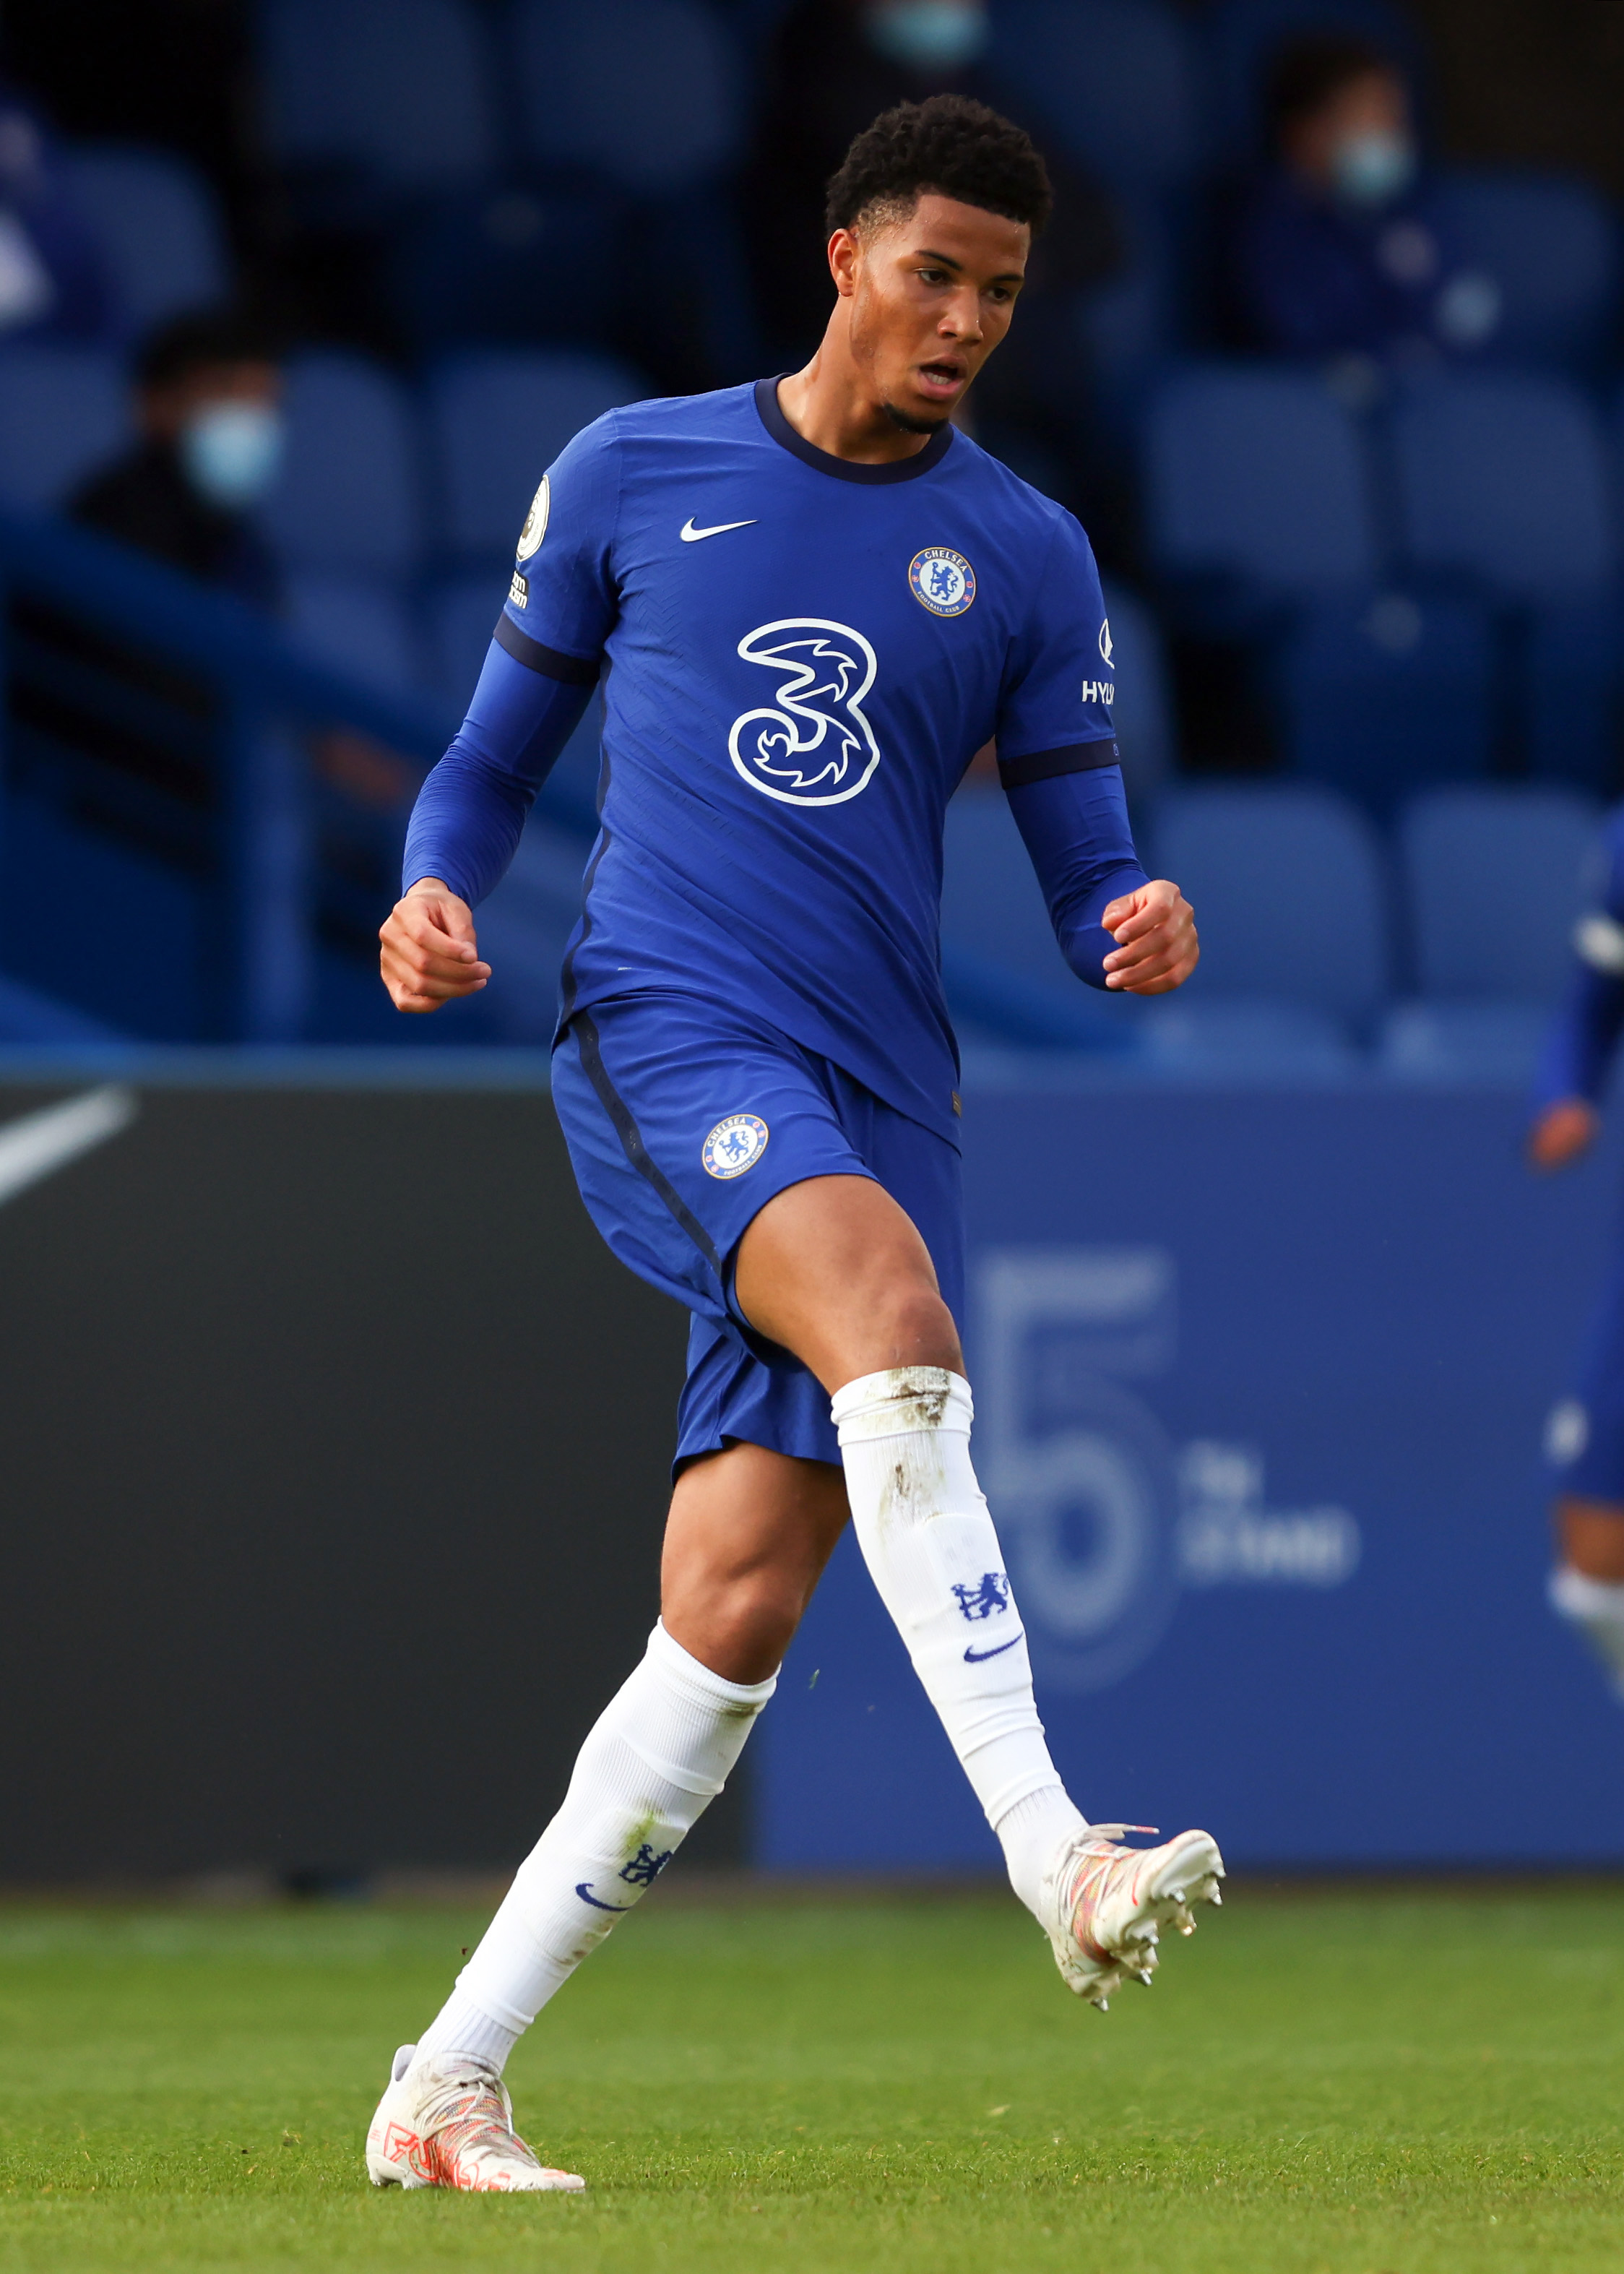 Chelsea v Blackburn Rovers - Premier League 2